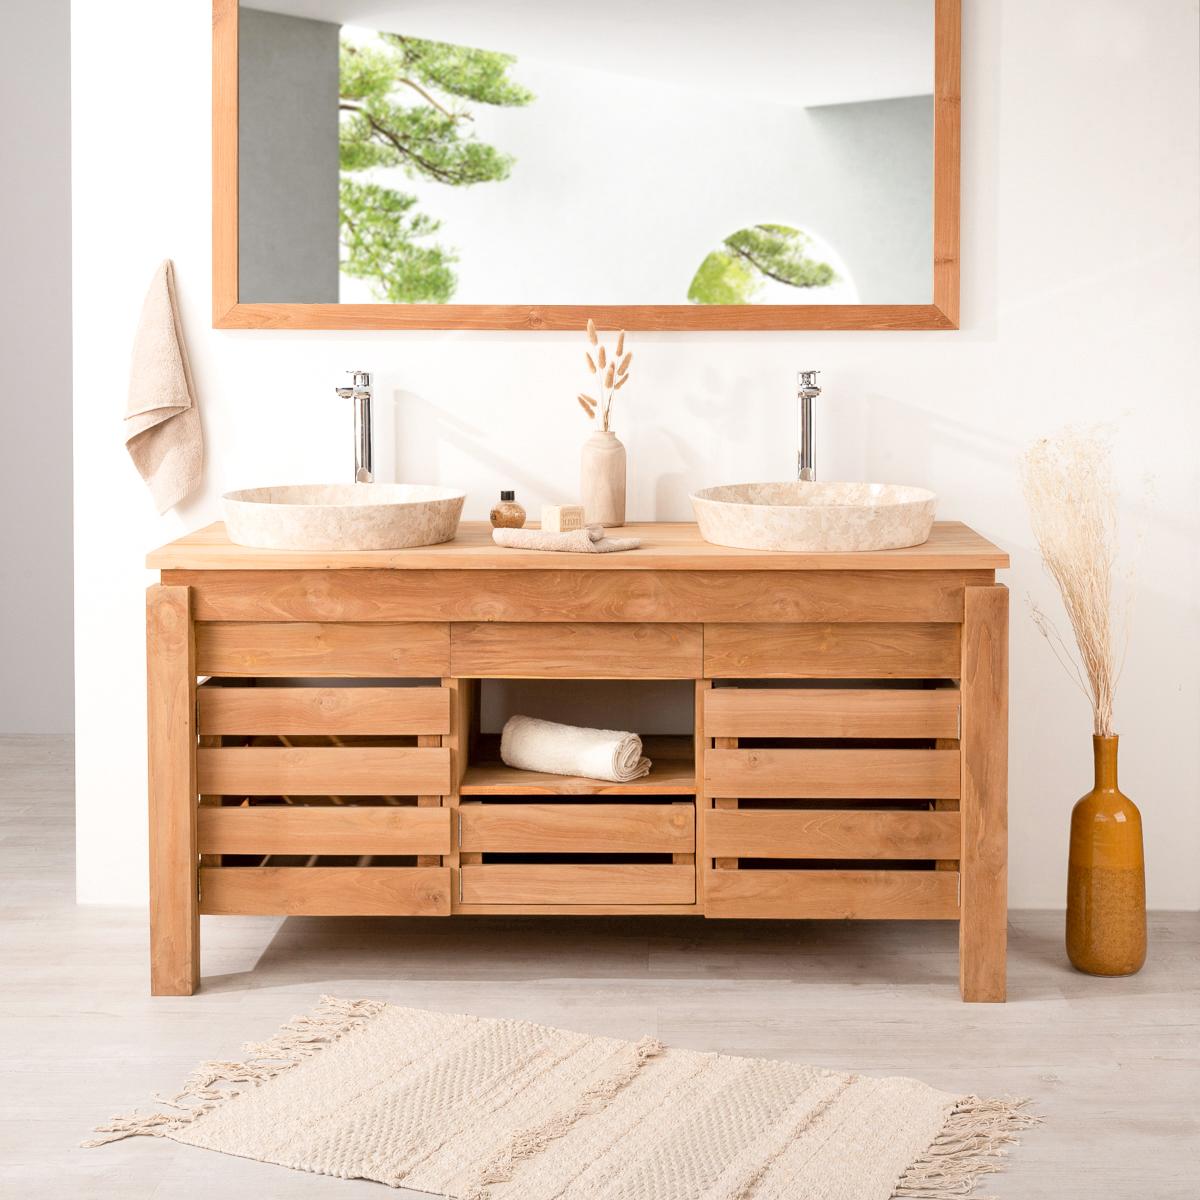 Mueble para lavabo doble de madera teca maciza zen for Mueble lavabo madera